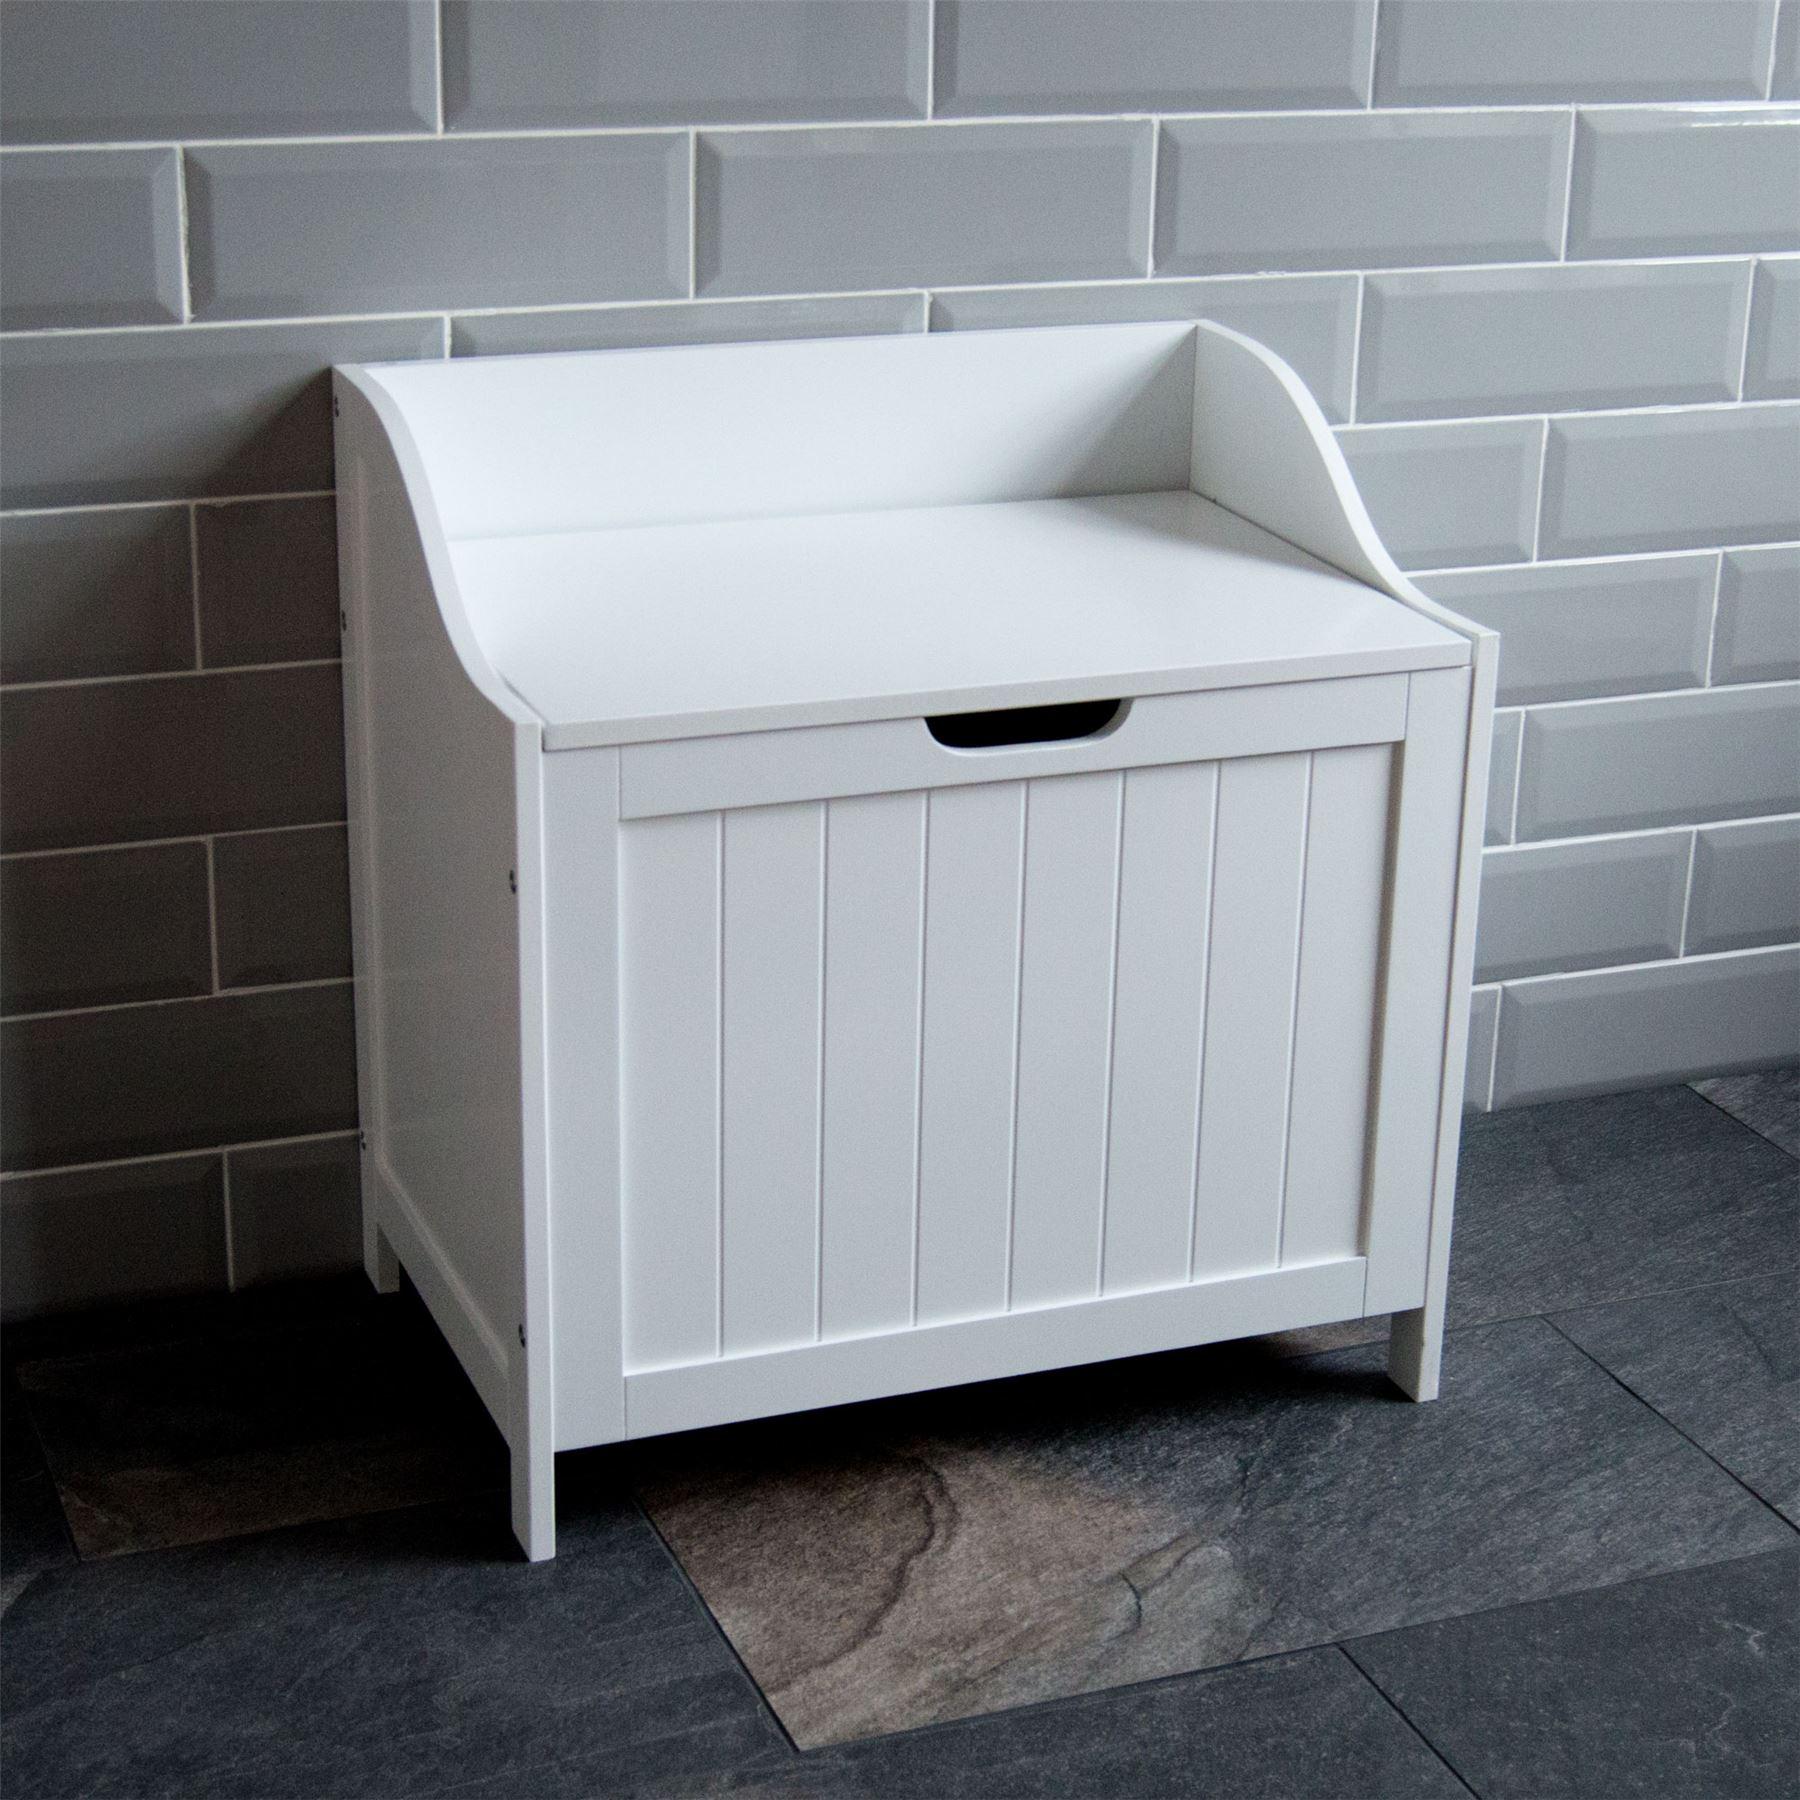 Priano Bathroom Laundry Cabinet Storage Bin Chest Basket